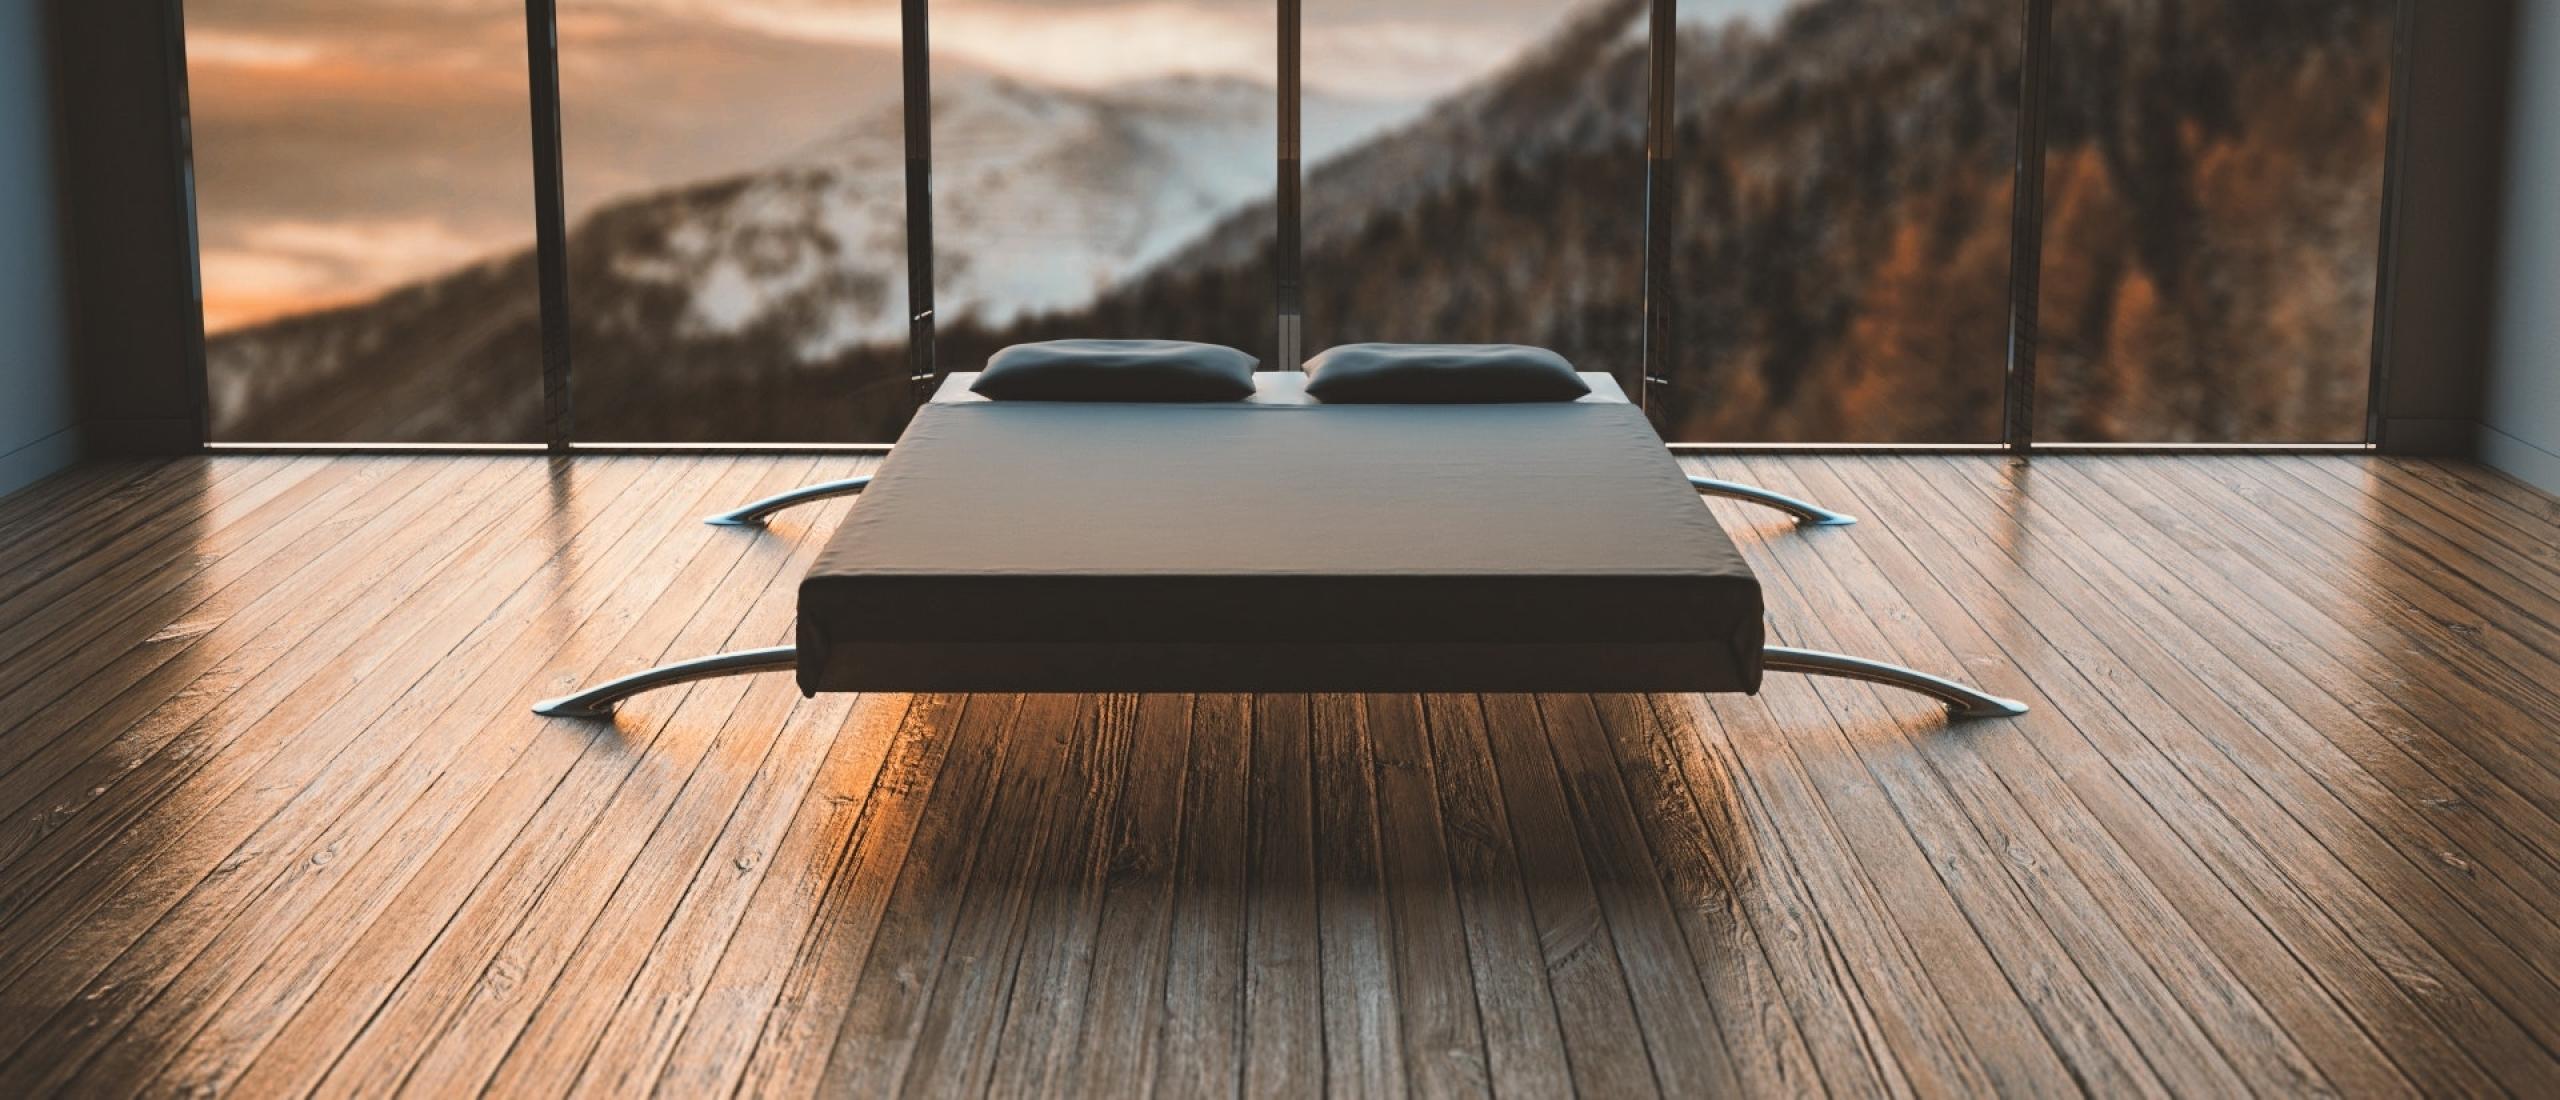 minimalisme-bed